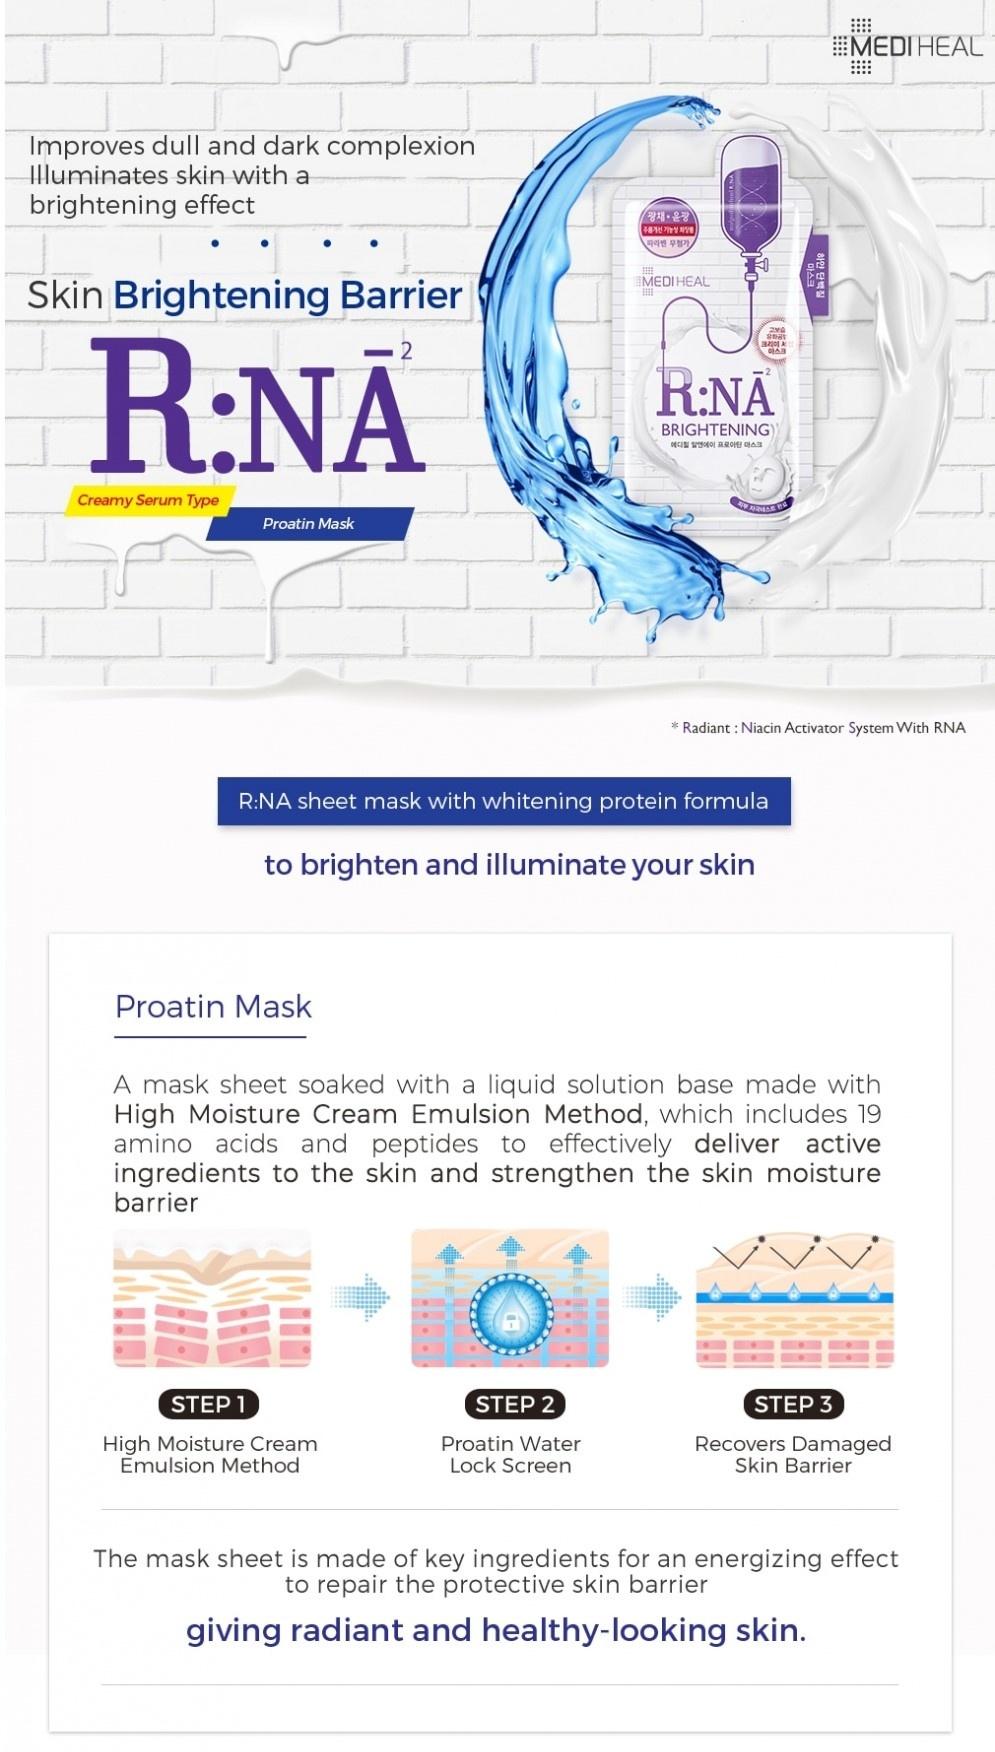 Proatin Mask R.NA Brightening-2